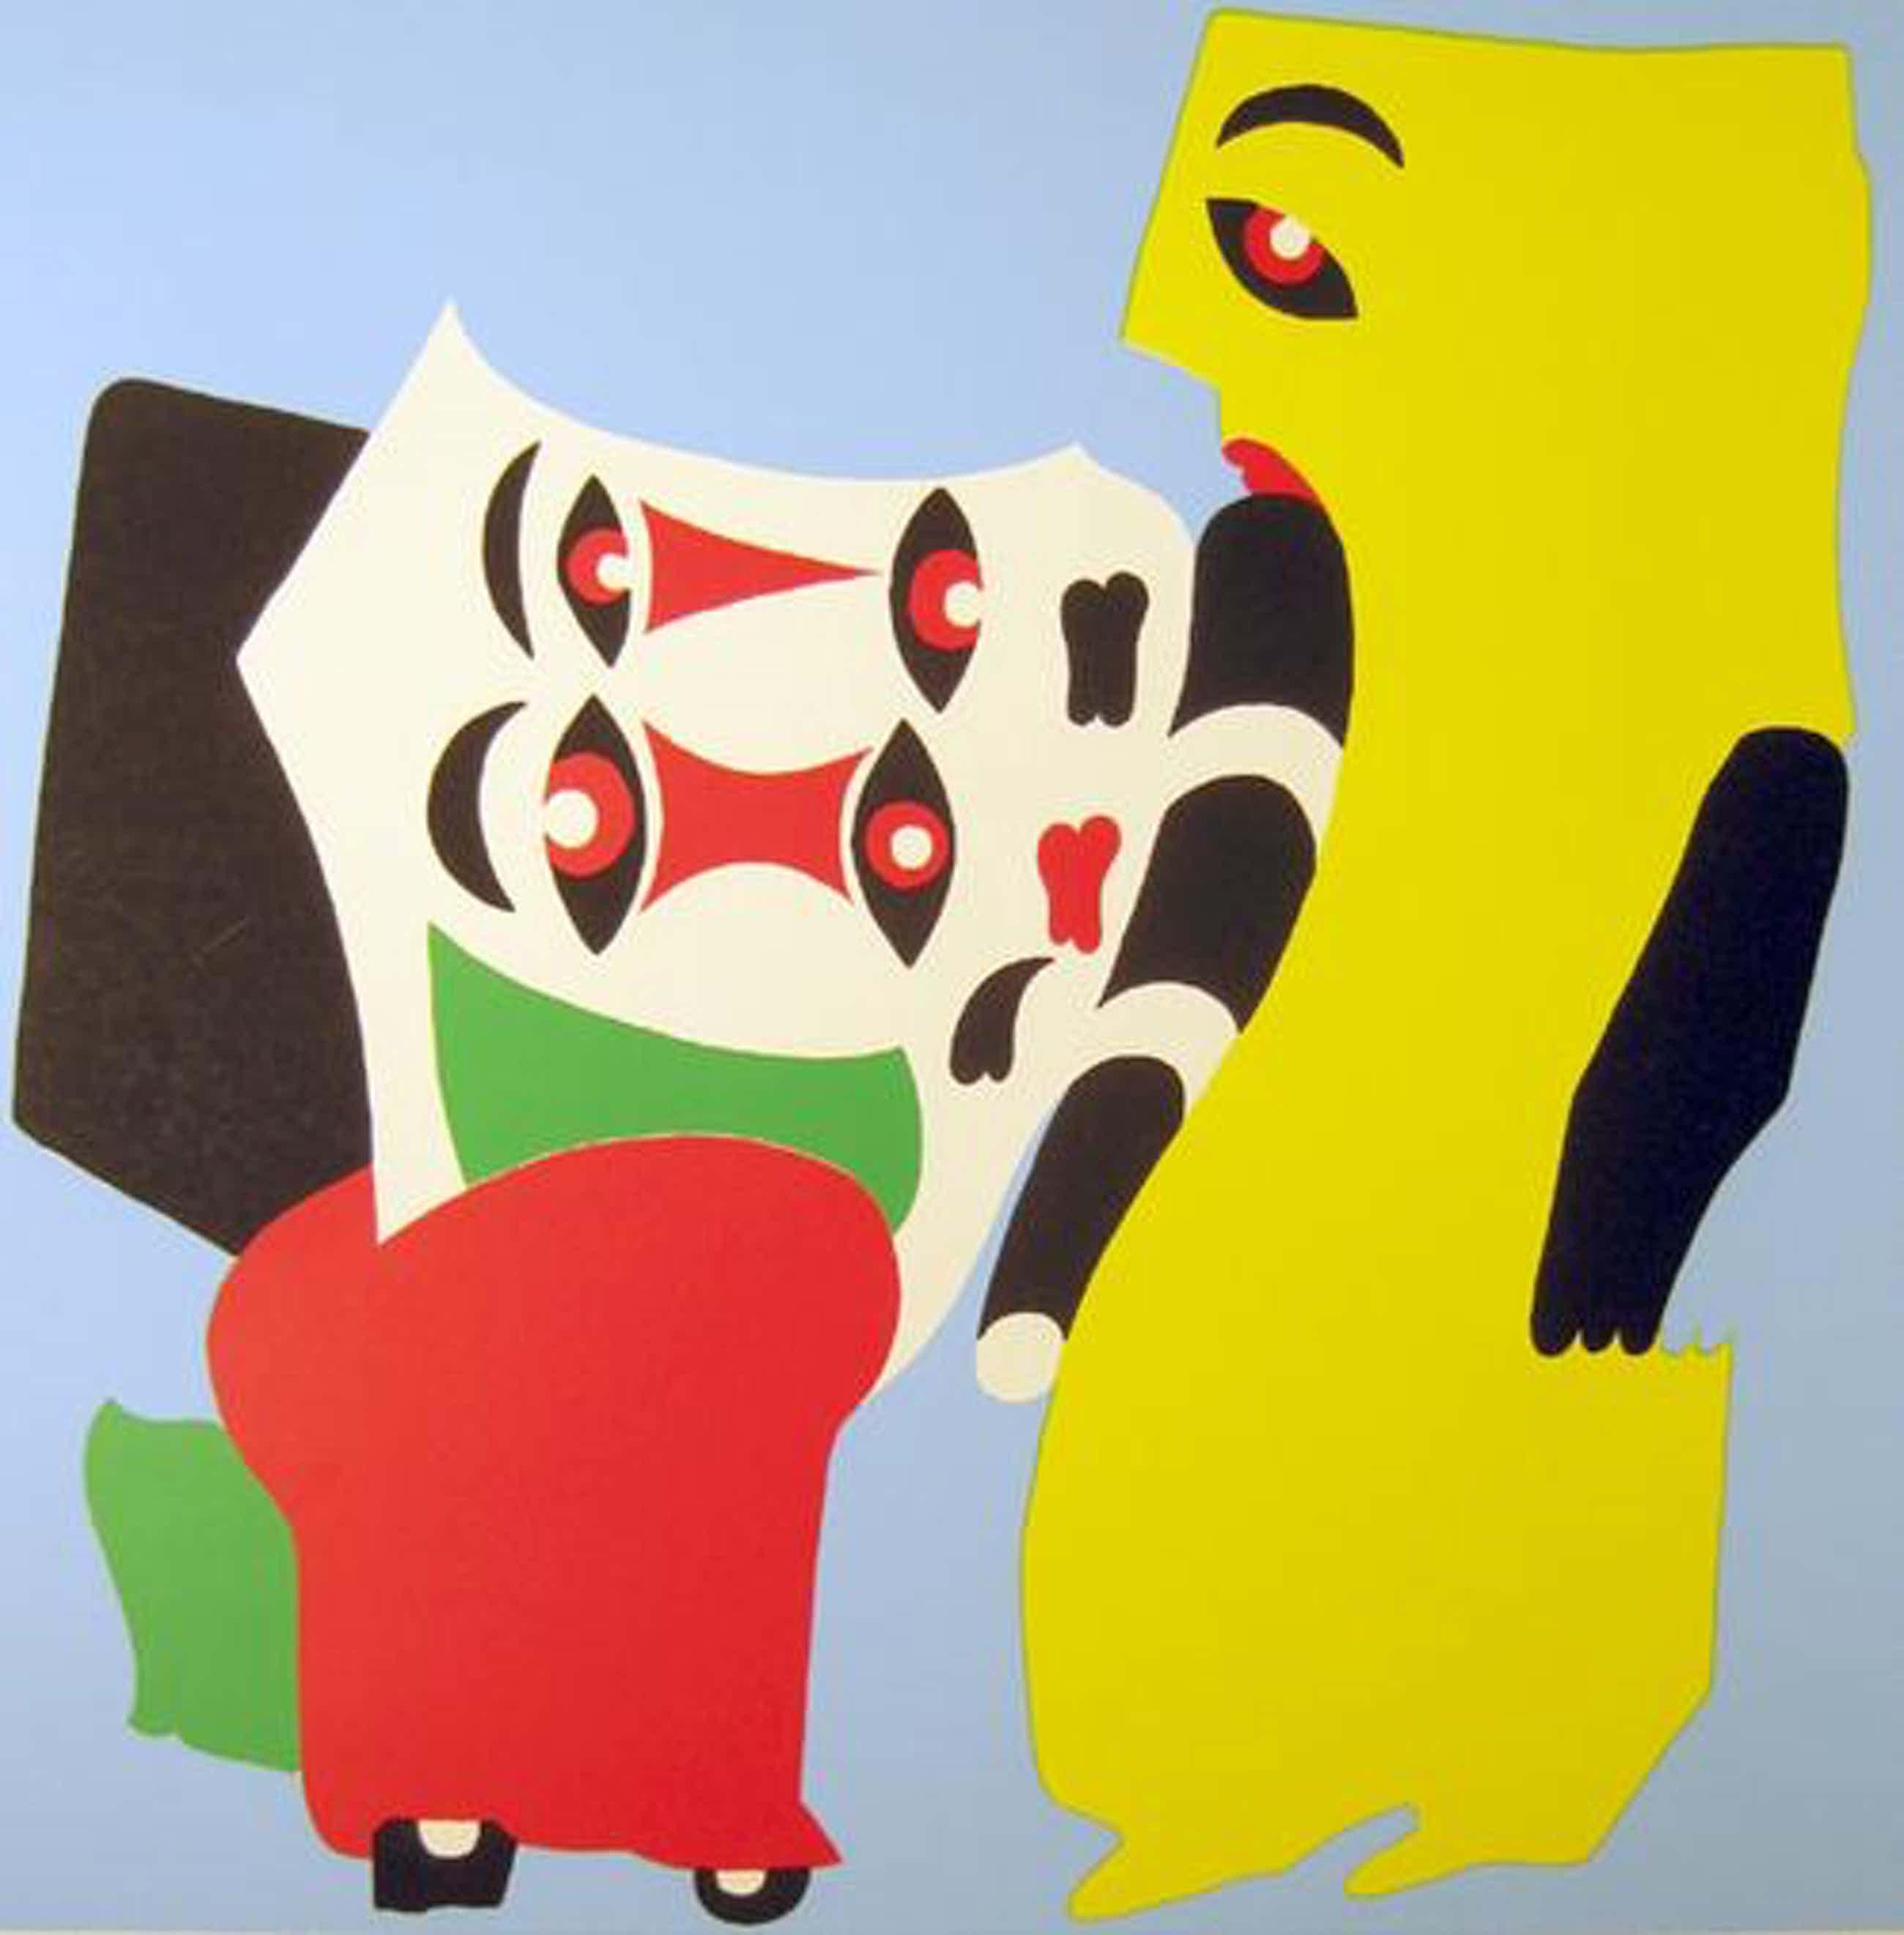 Atila Biro - Harlekin, Farbserigraphie,1972 kopen? Bied vanaf 55!